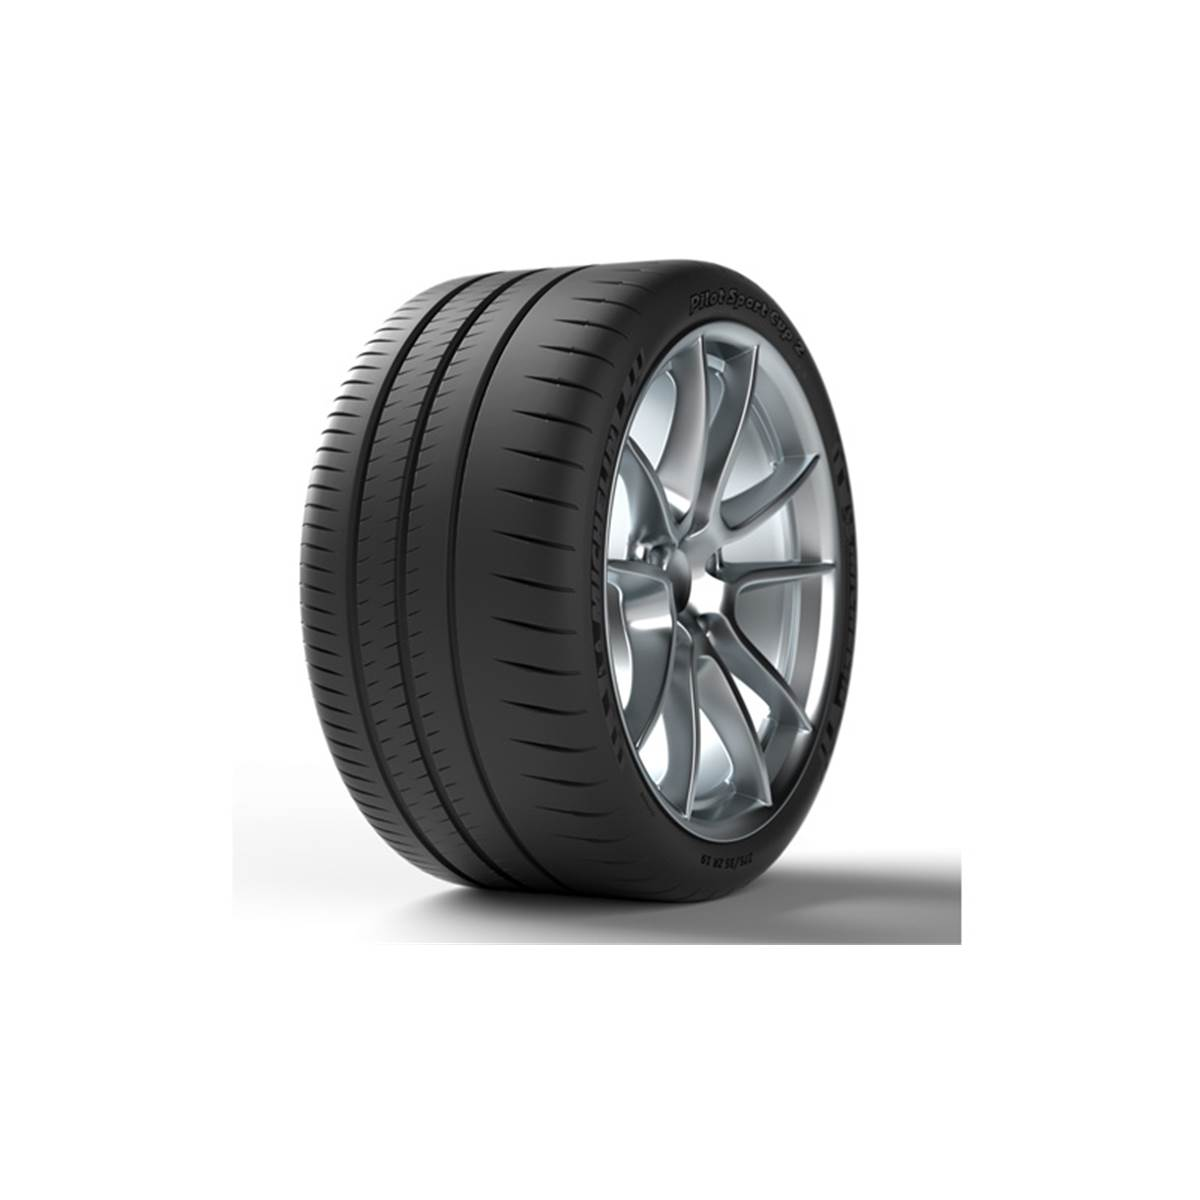 Pneu Michelin 295/30R18 98Y Pilot Sport Cup 2 XL